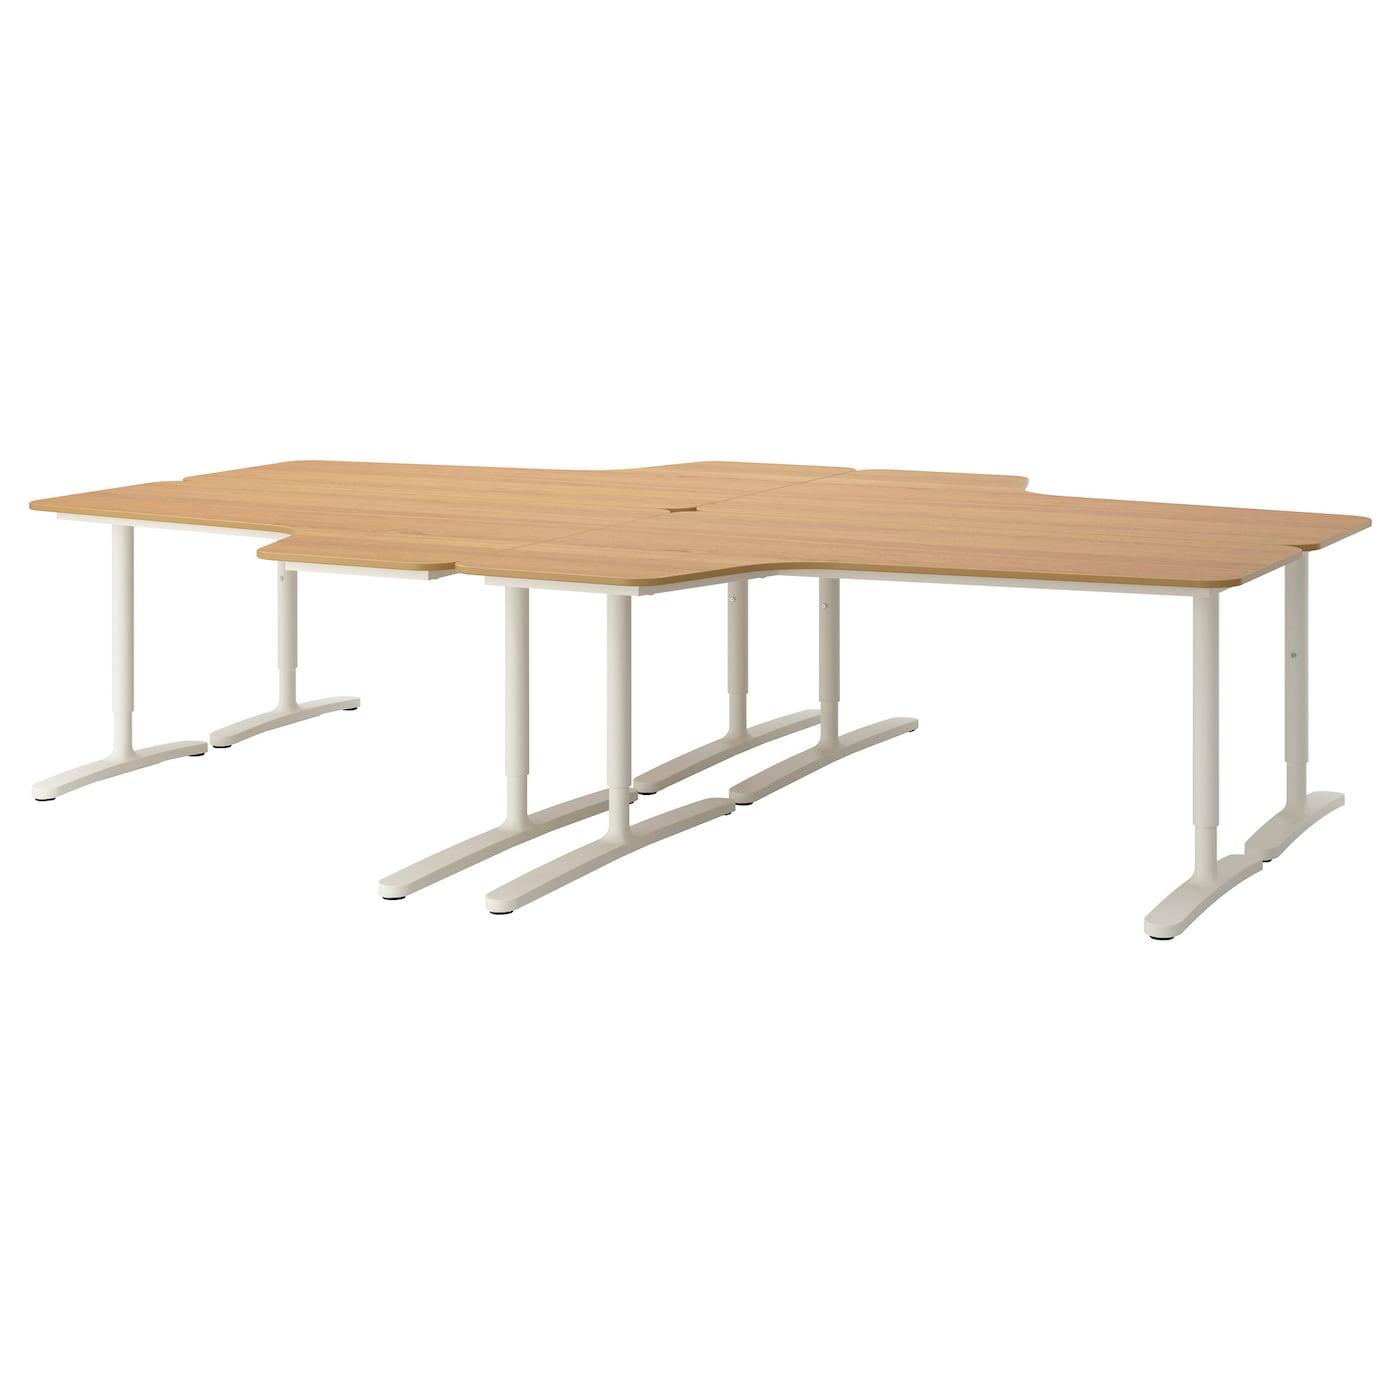 bekant desk combination oak veneer white 320 x 220 cm ikea. Black Bedroom Furniture Sets. Home Design Ideas